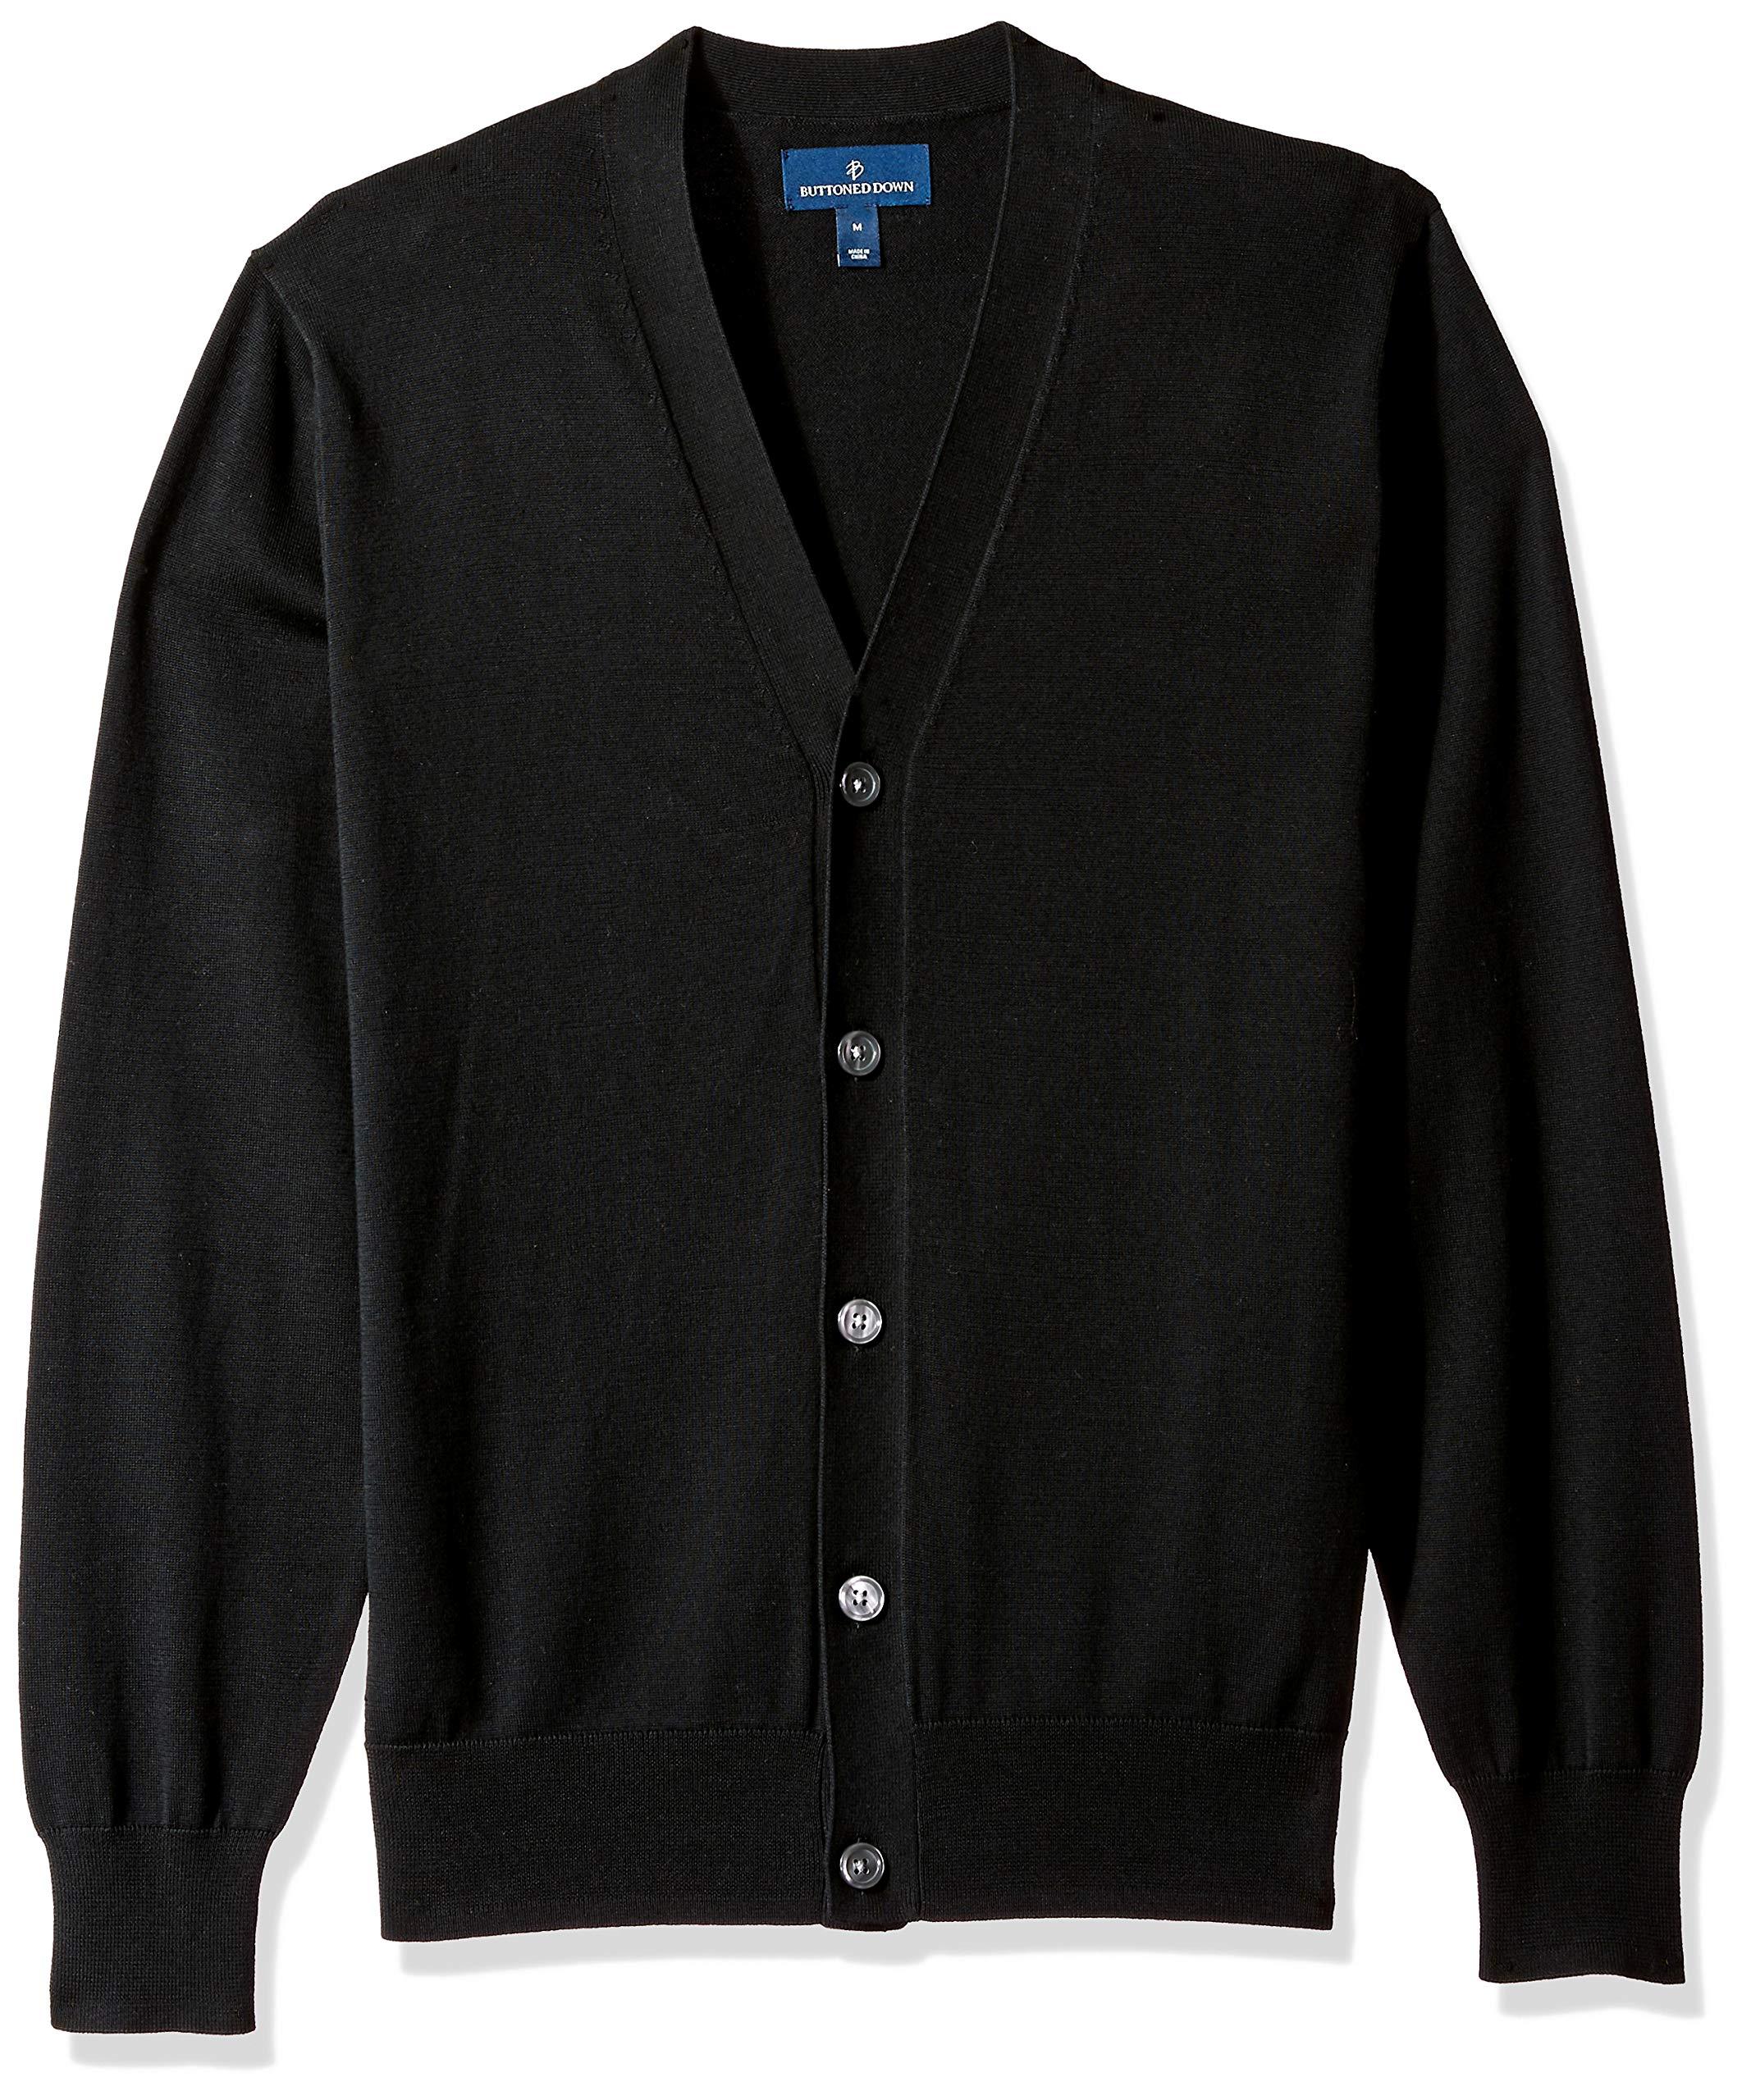 BUTTONED DOWN Men's Supima Cotton Lightweight Cardigan Sweater, black, Medium